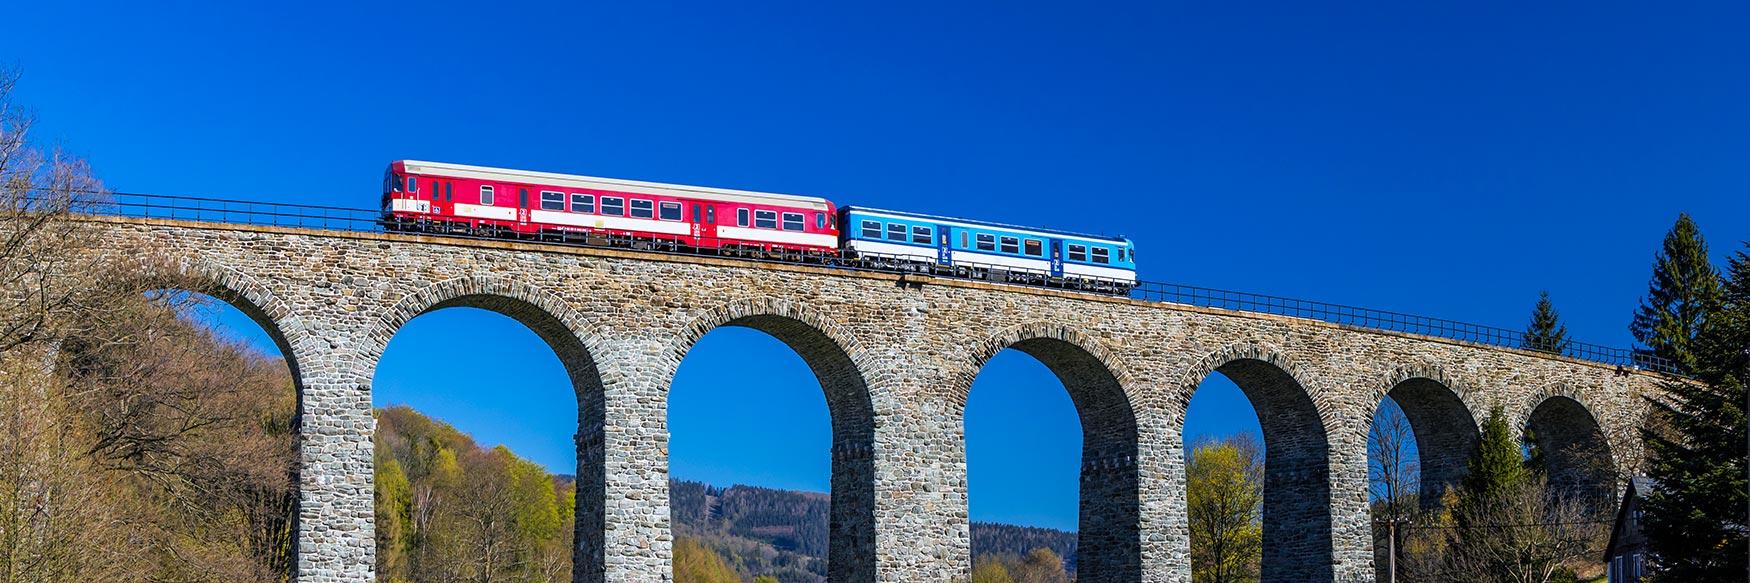 Train Travel in Czechia